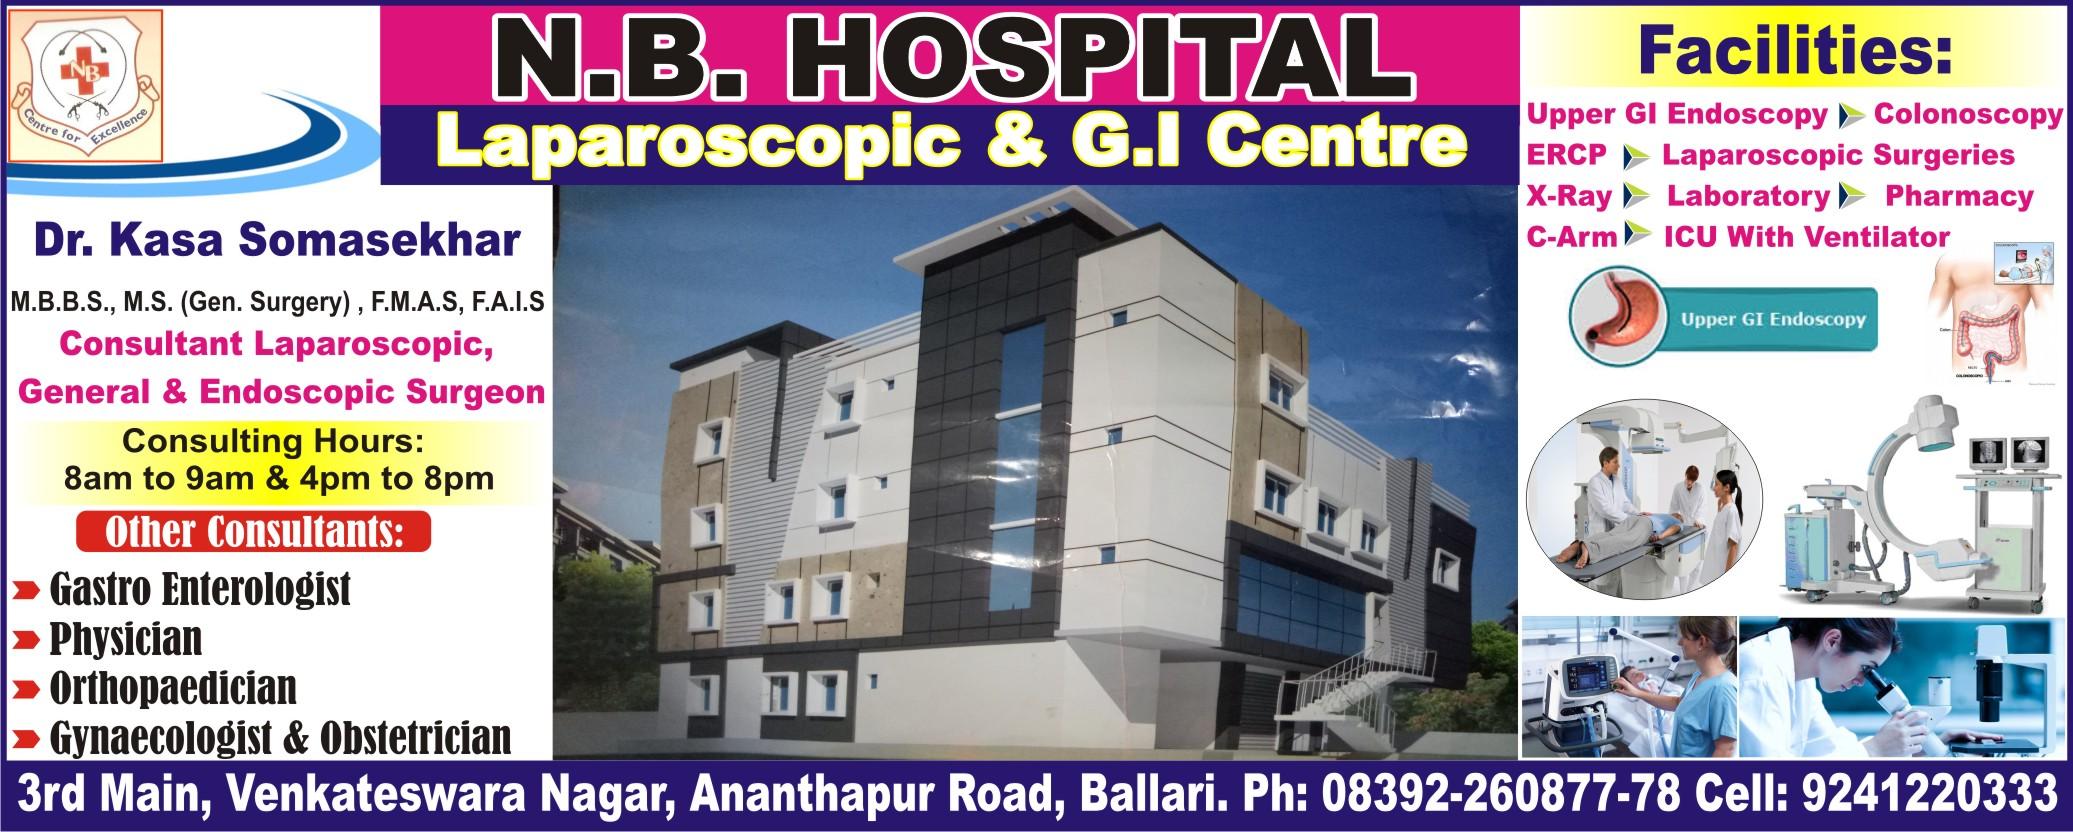 N.B. Hospital